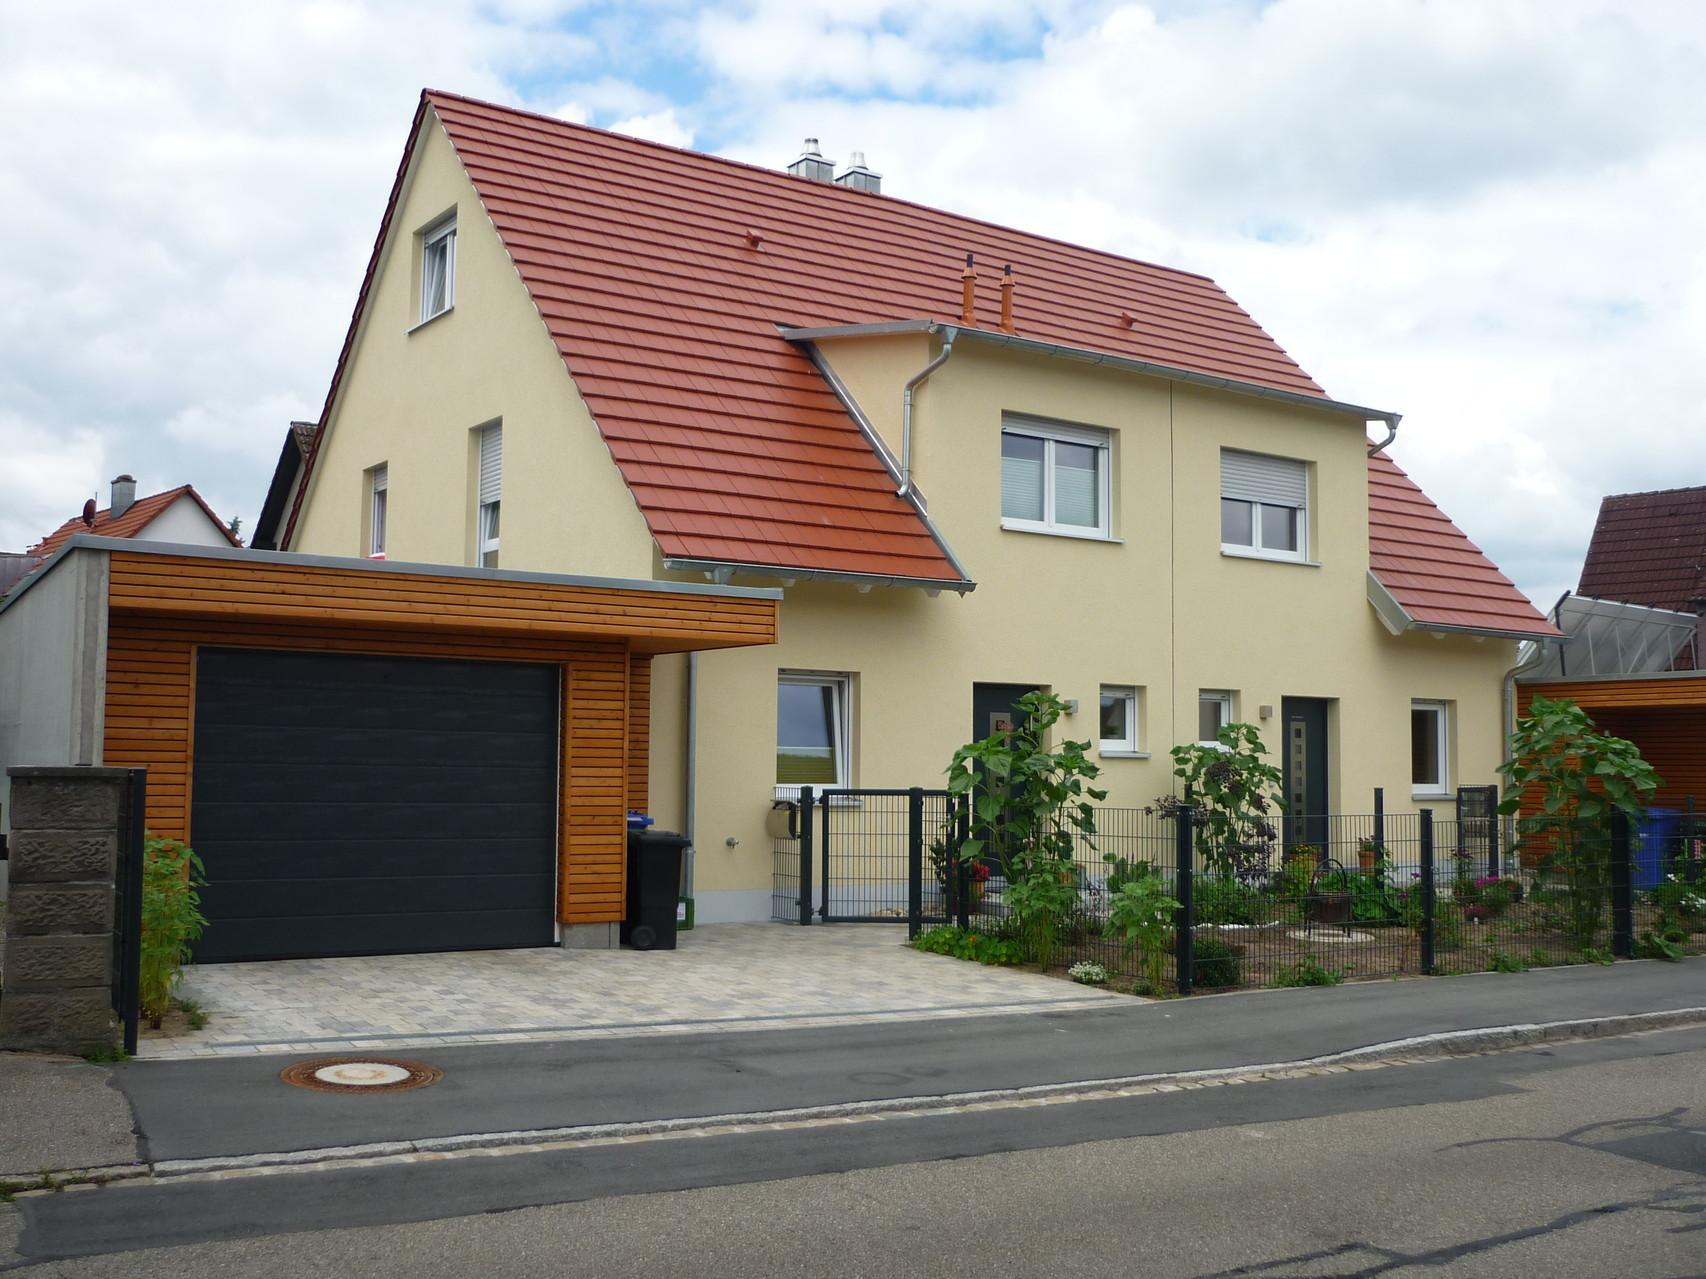 Projekt: Neubau Doppelhaus